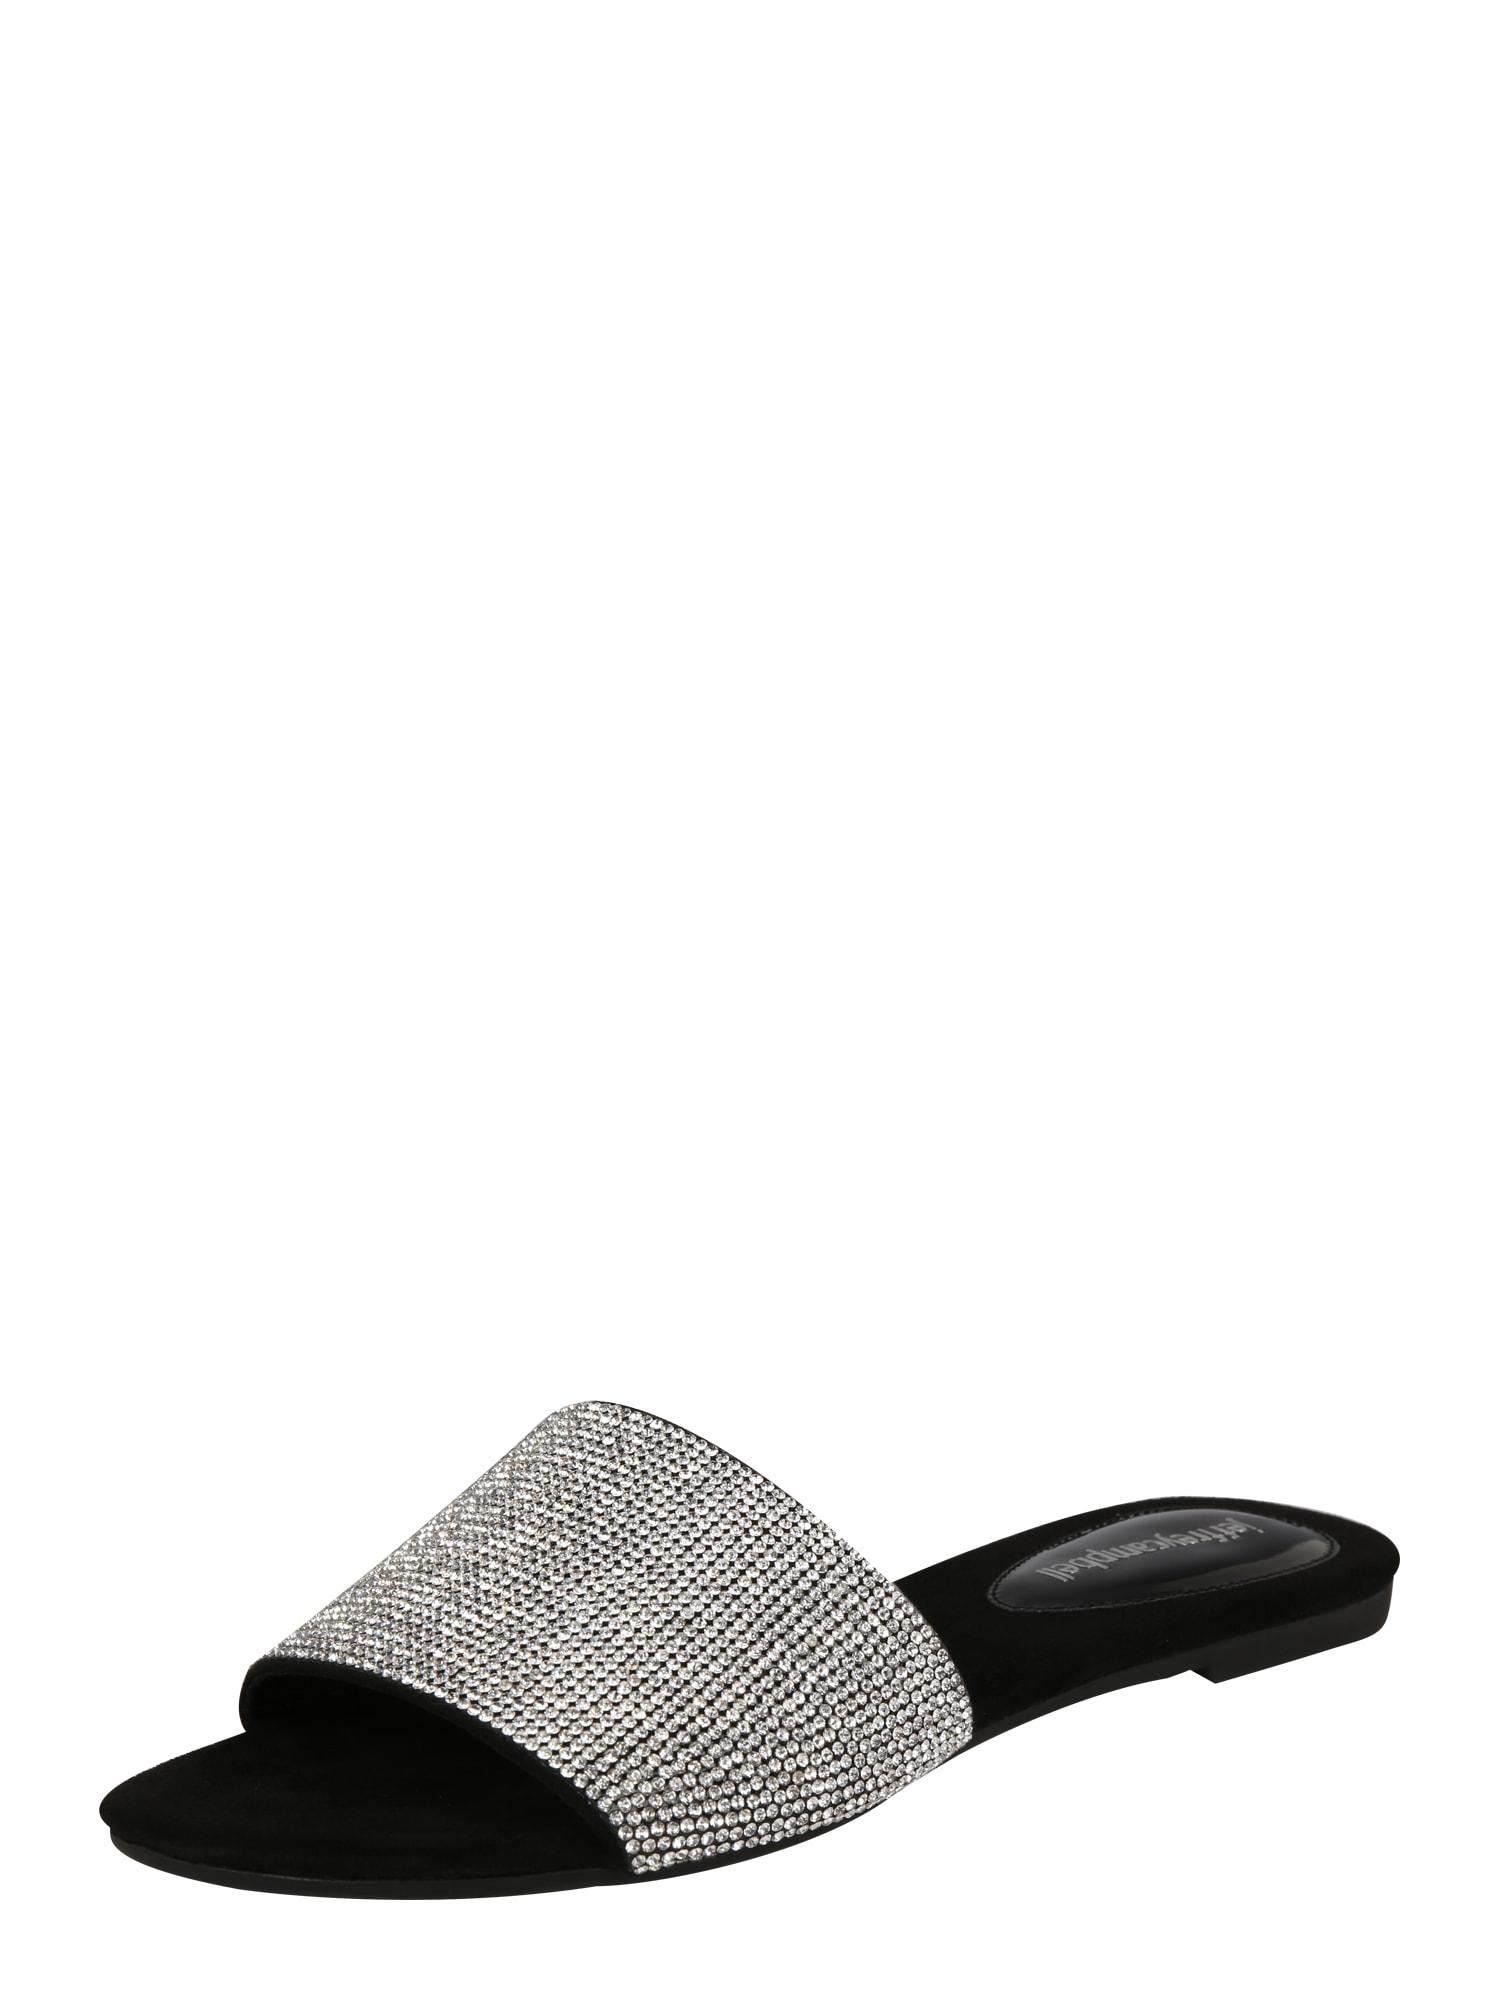 Slipper SPARQUE černá stříbrná Jeffrey Campbell